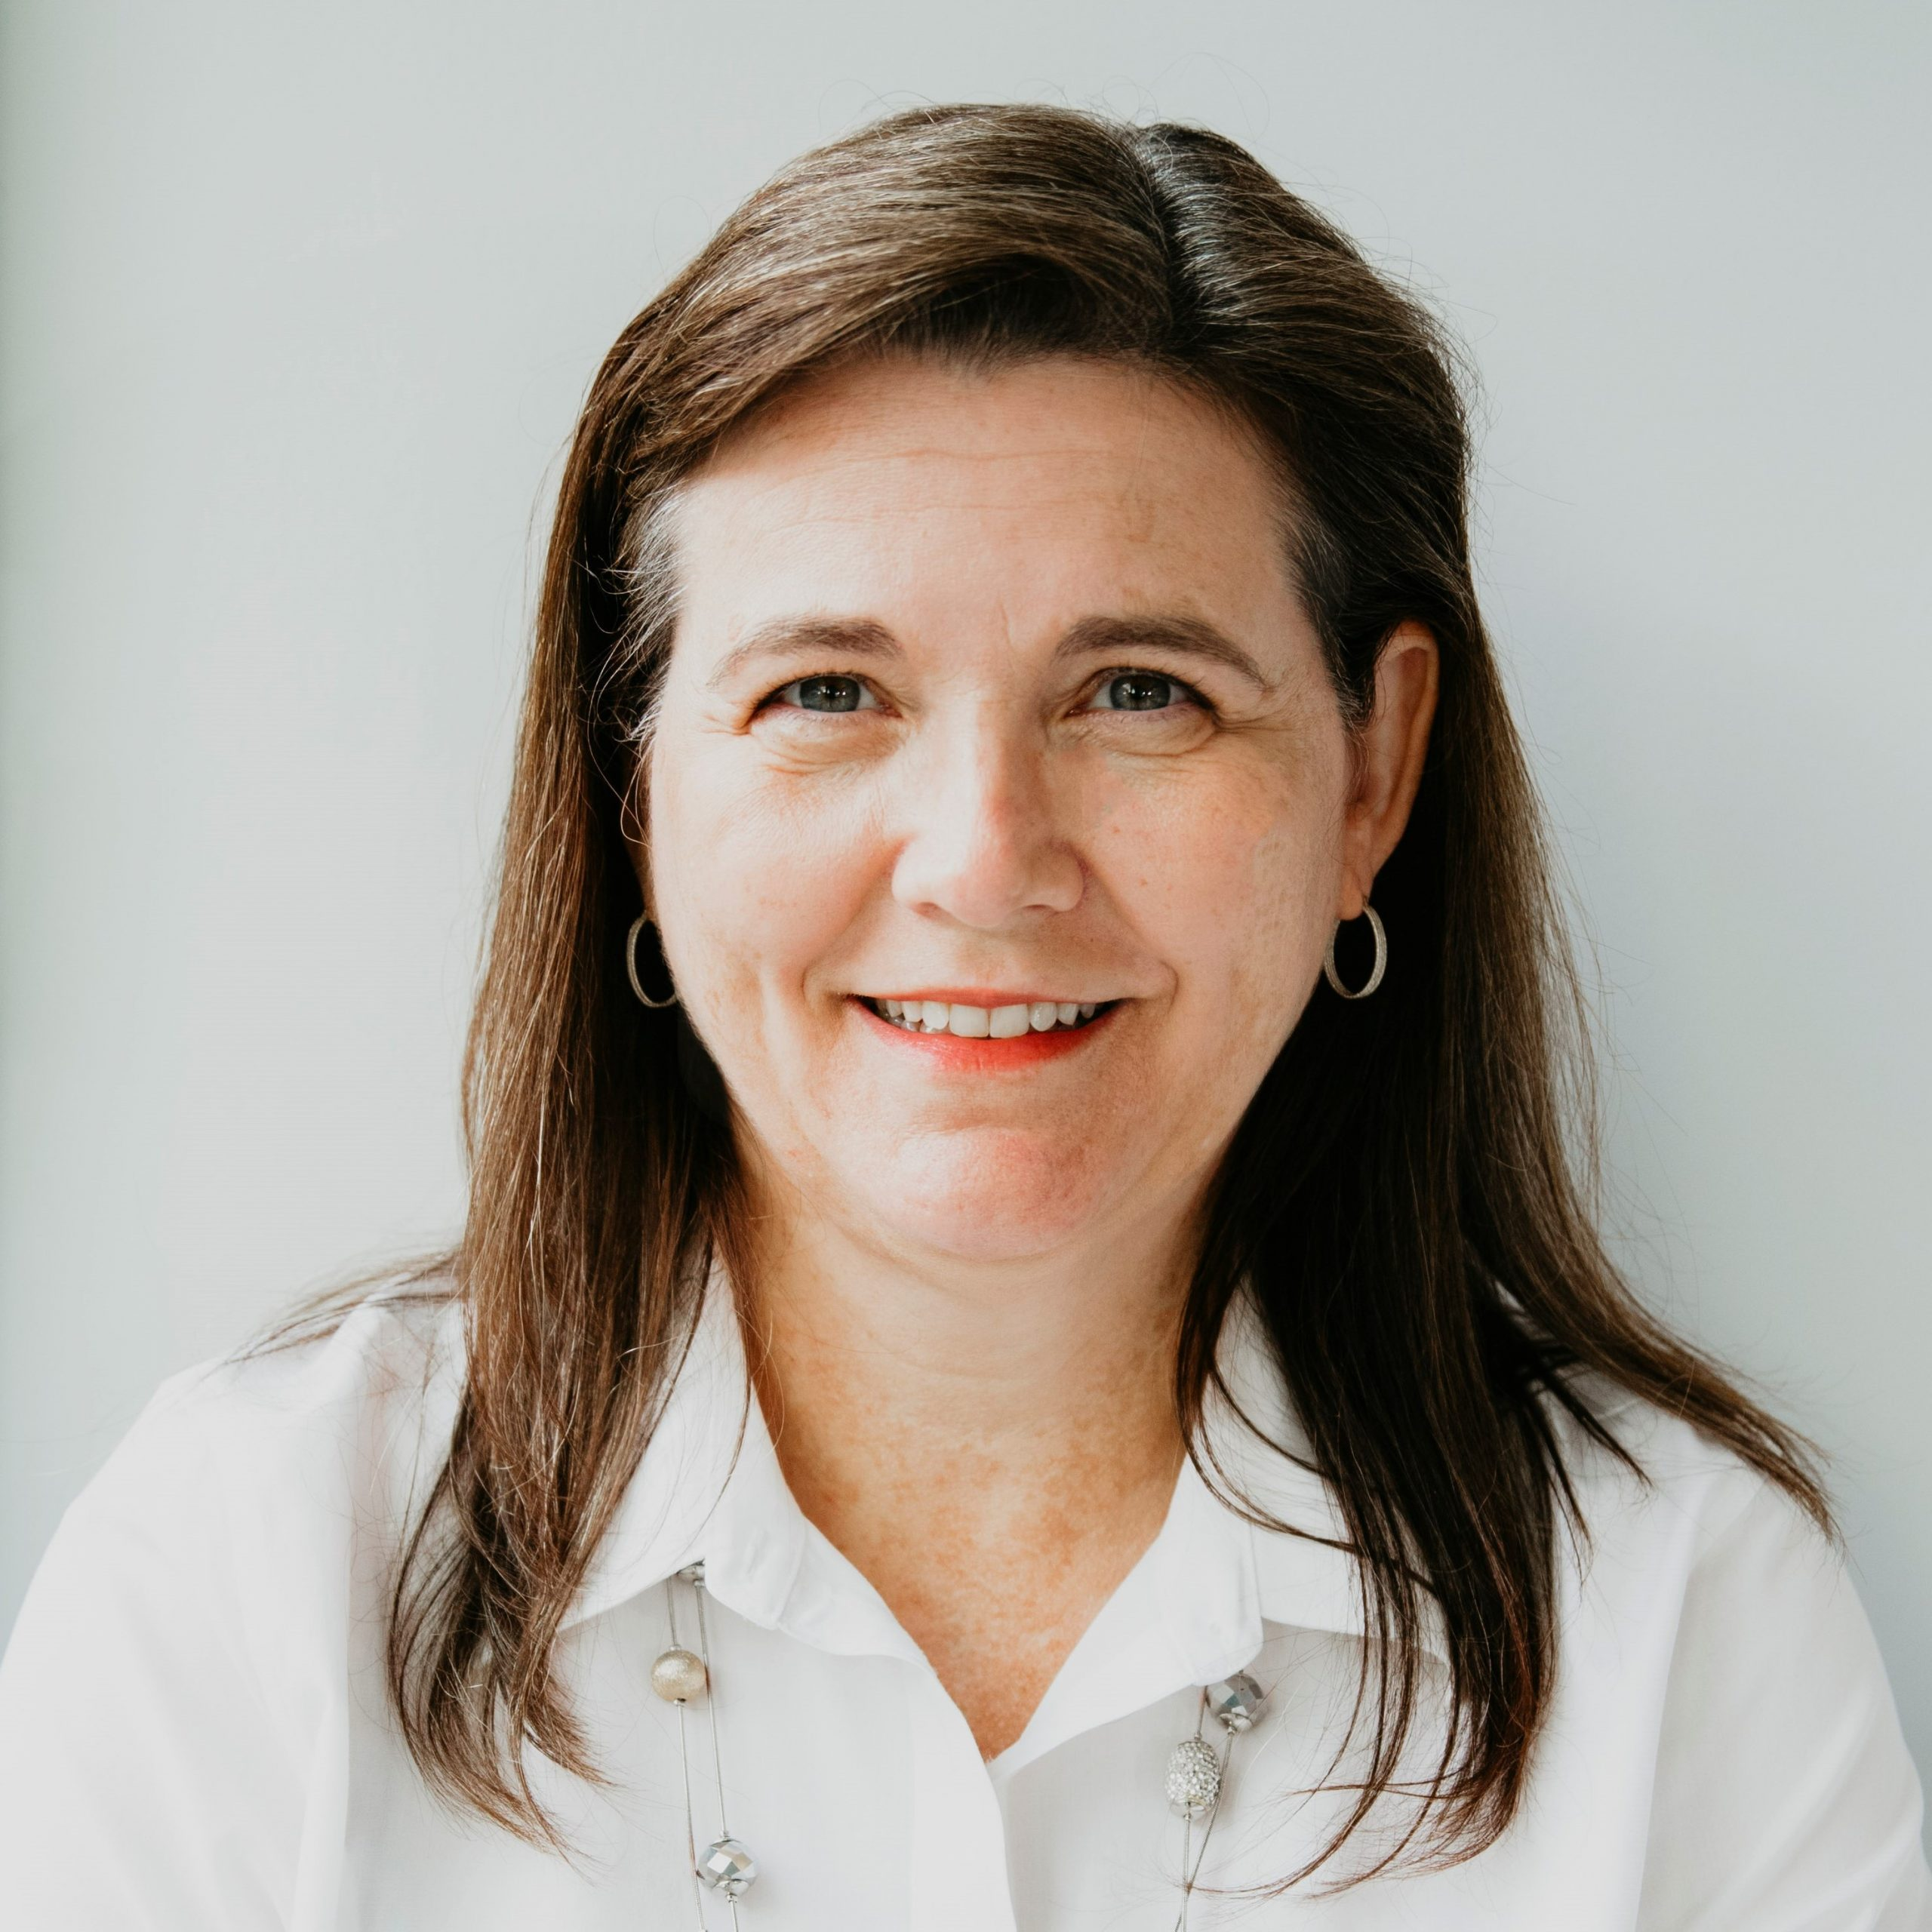 Joanna Isaacson